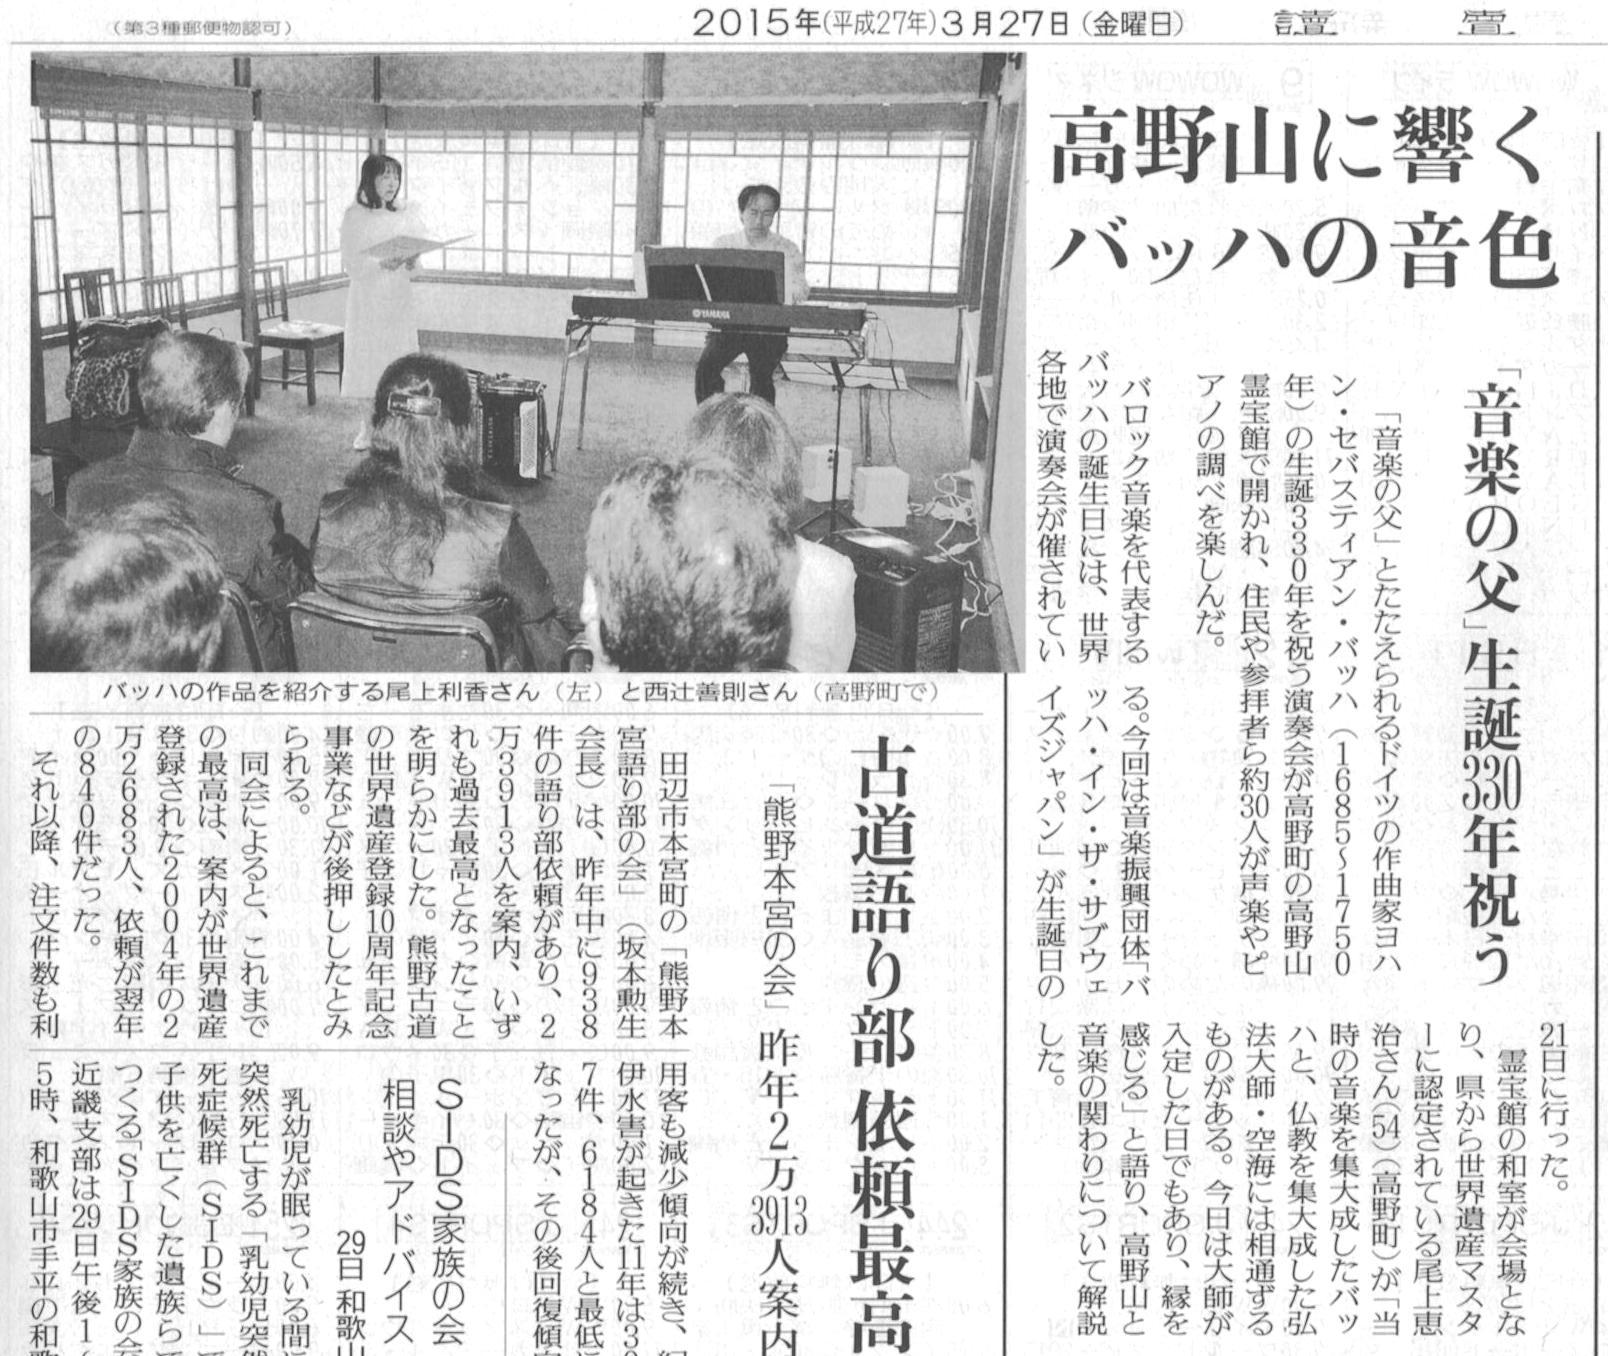 bitsjapan2015_news0327